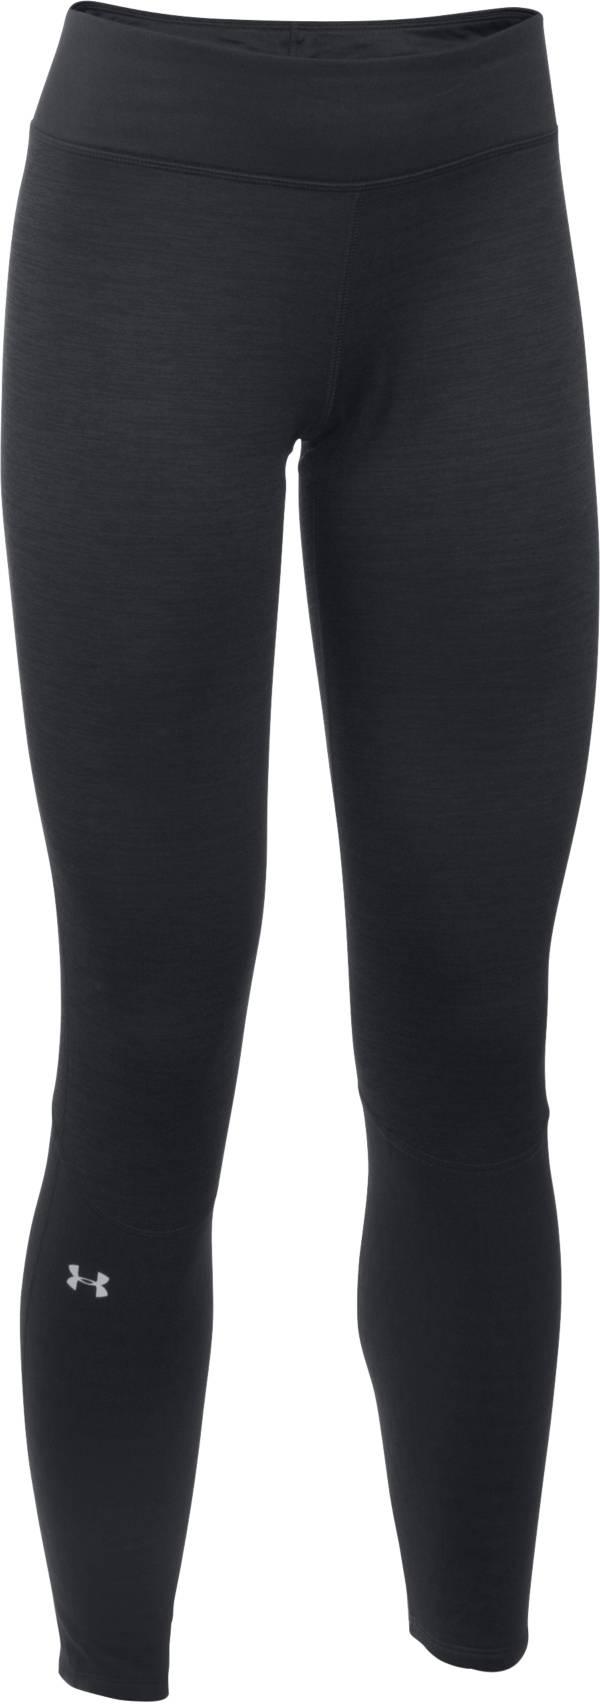 Under Armour Women's Base 4.0 Leggings product image